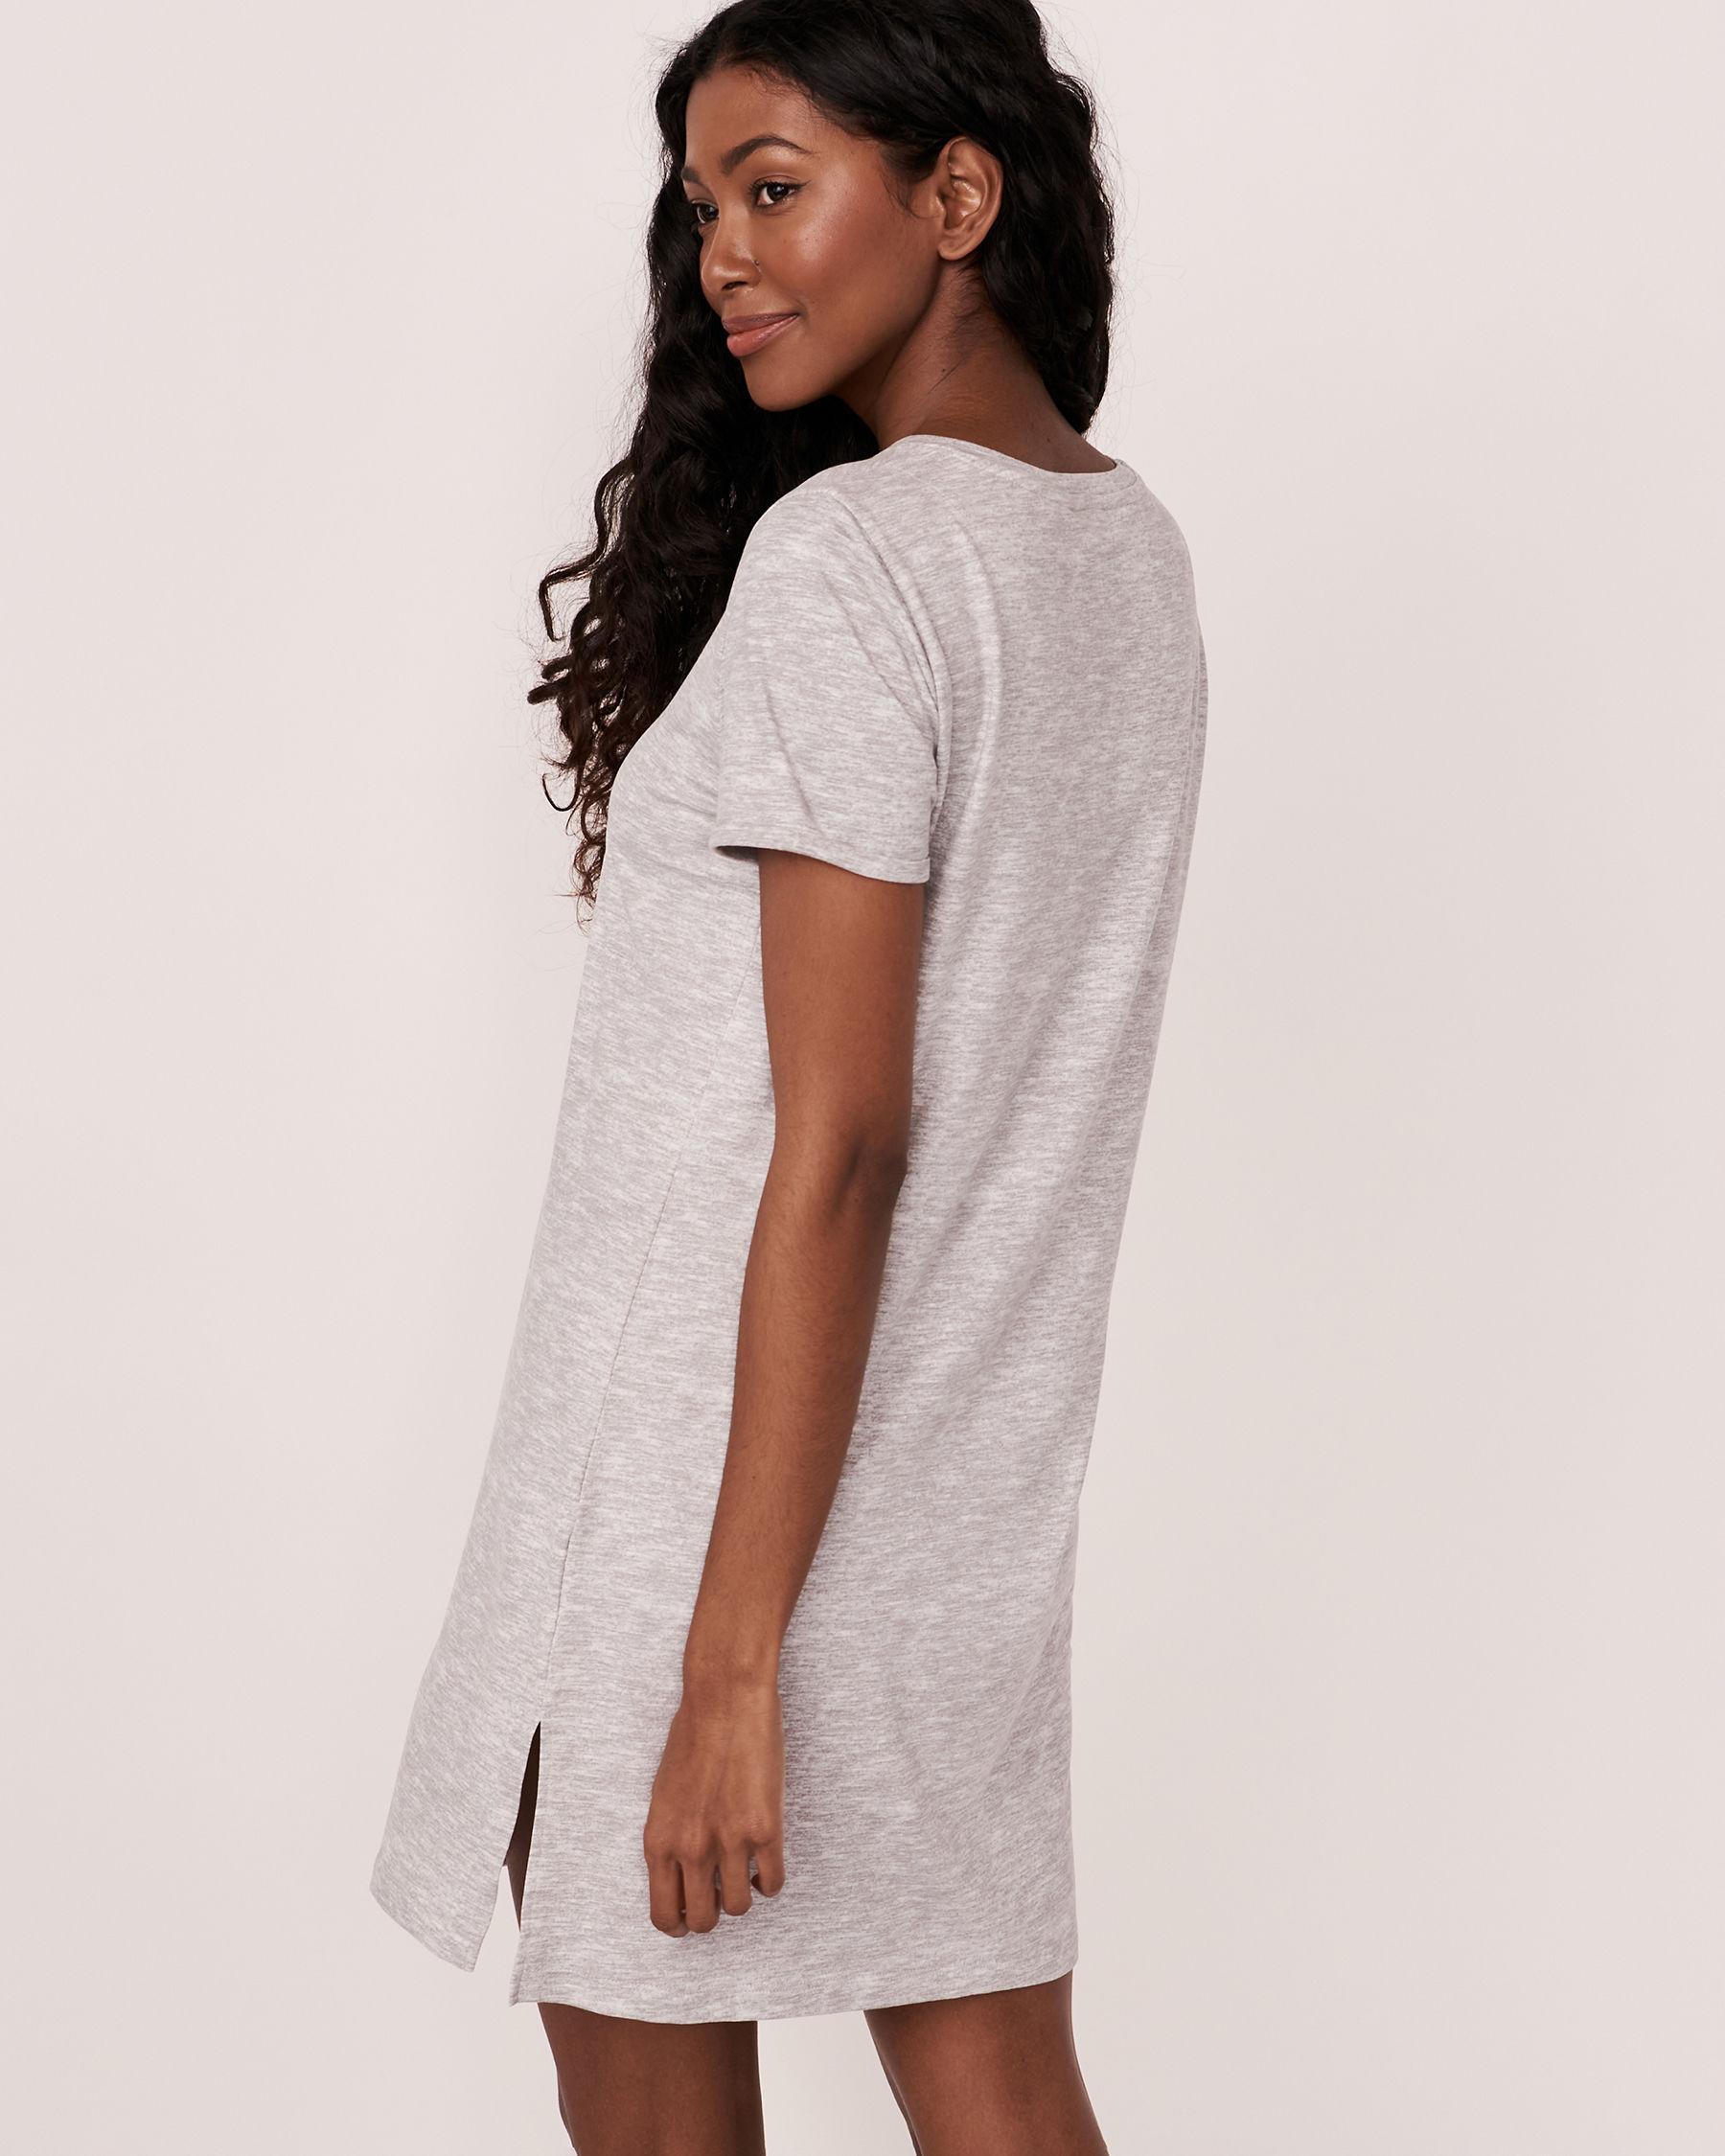 LA VIE EN ROSE V-neckline Short Sleeve Sleepshirt Grey 40500082 - View3